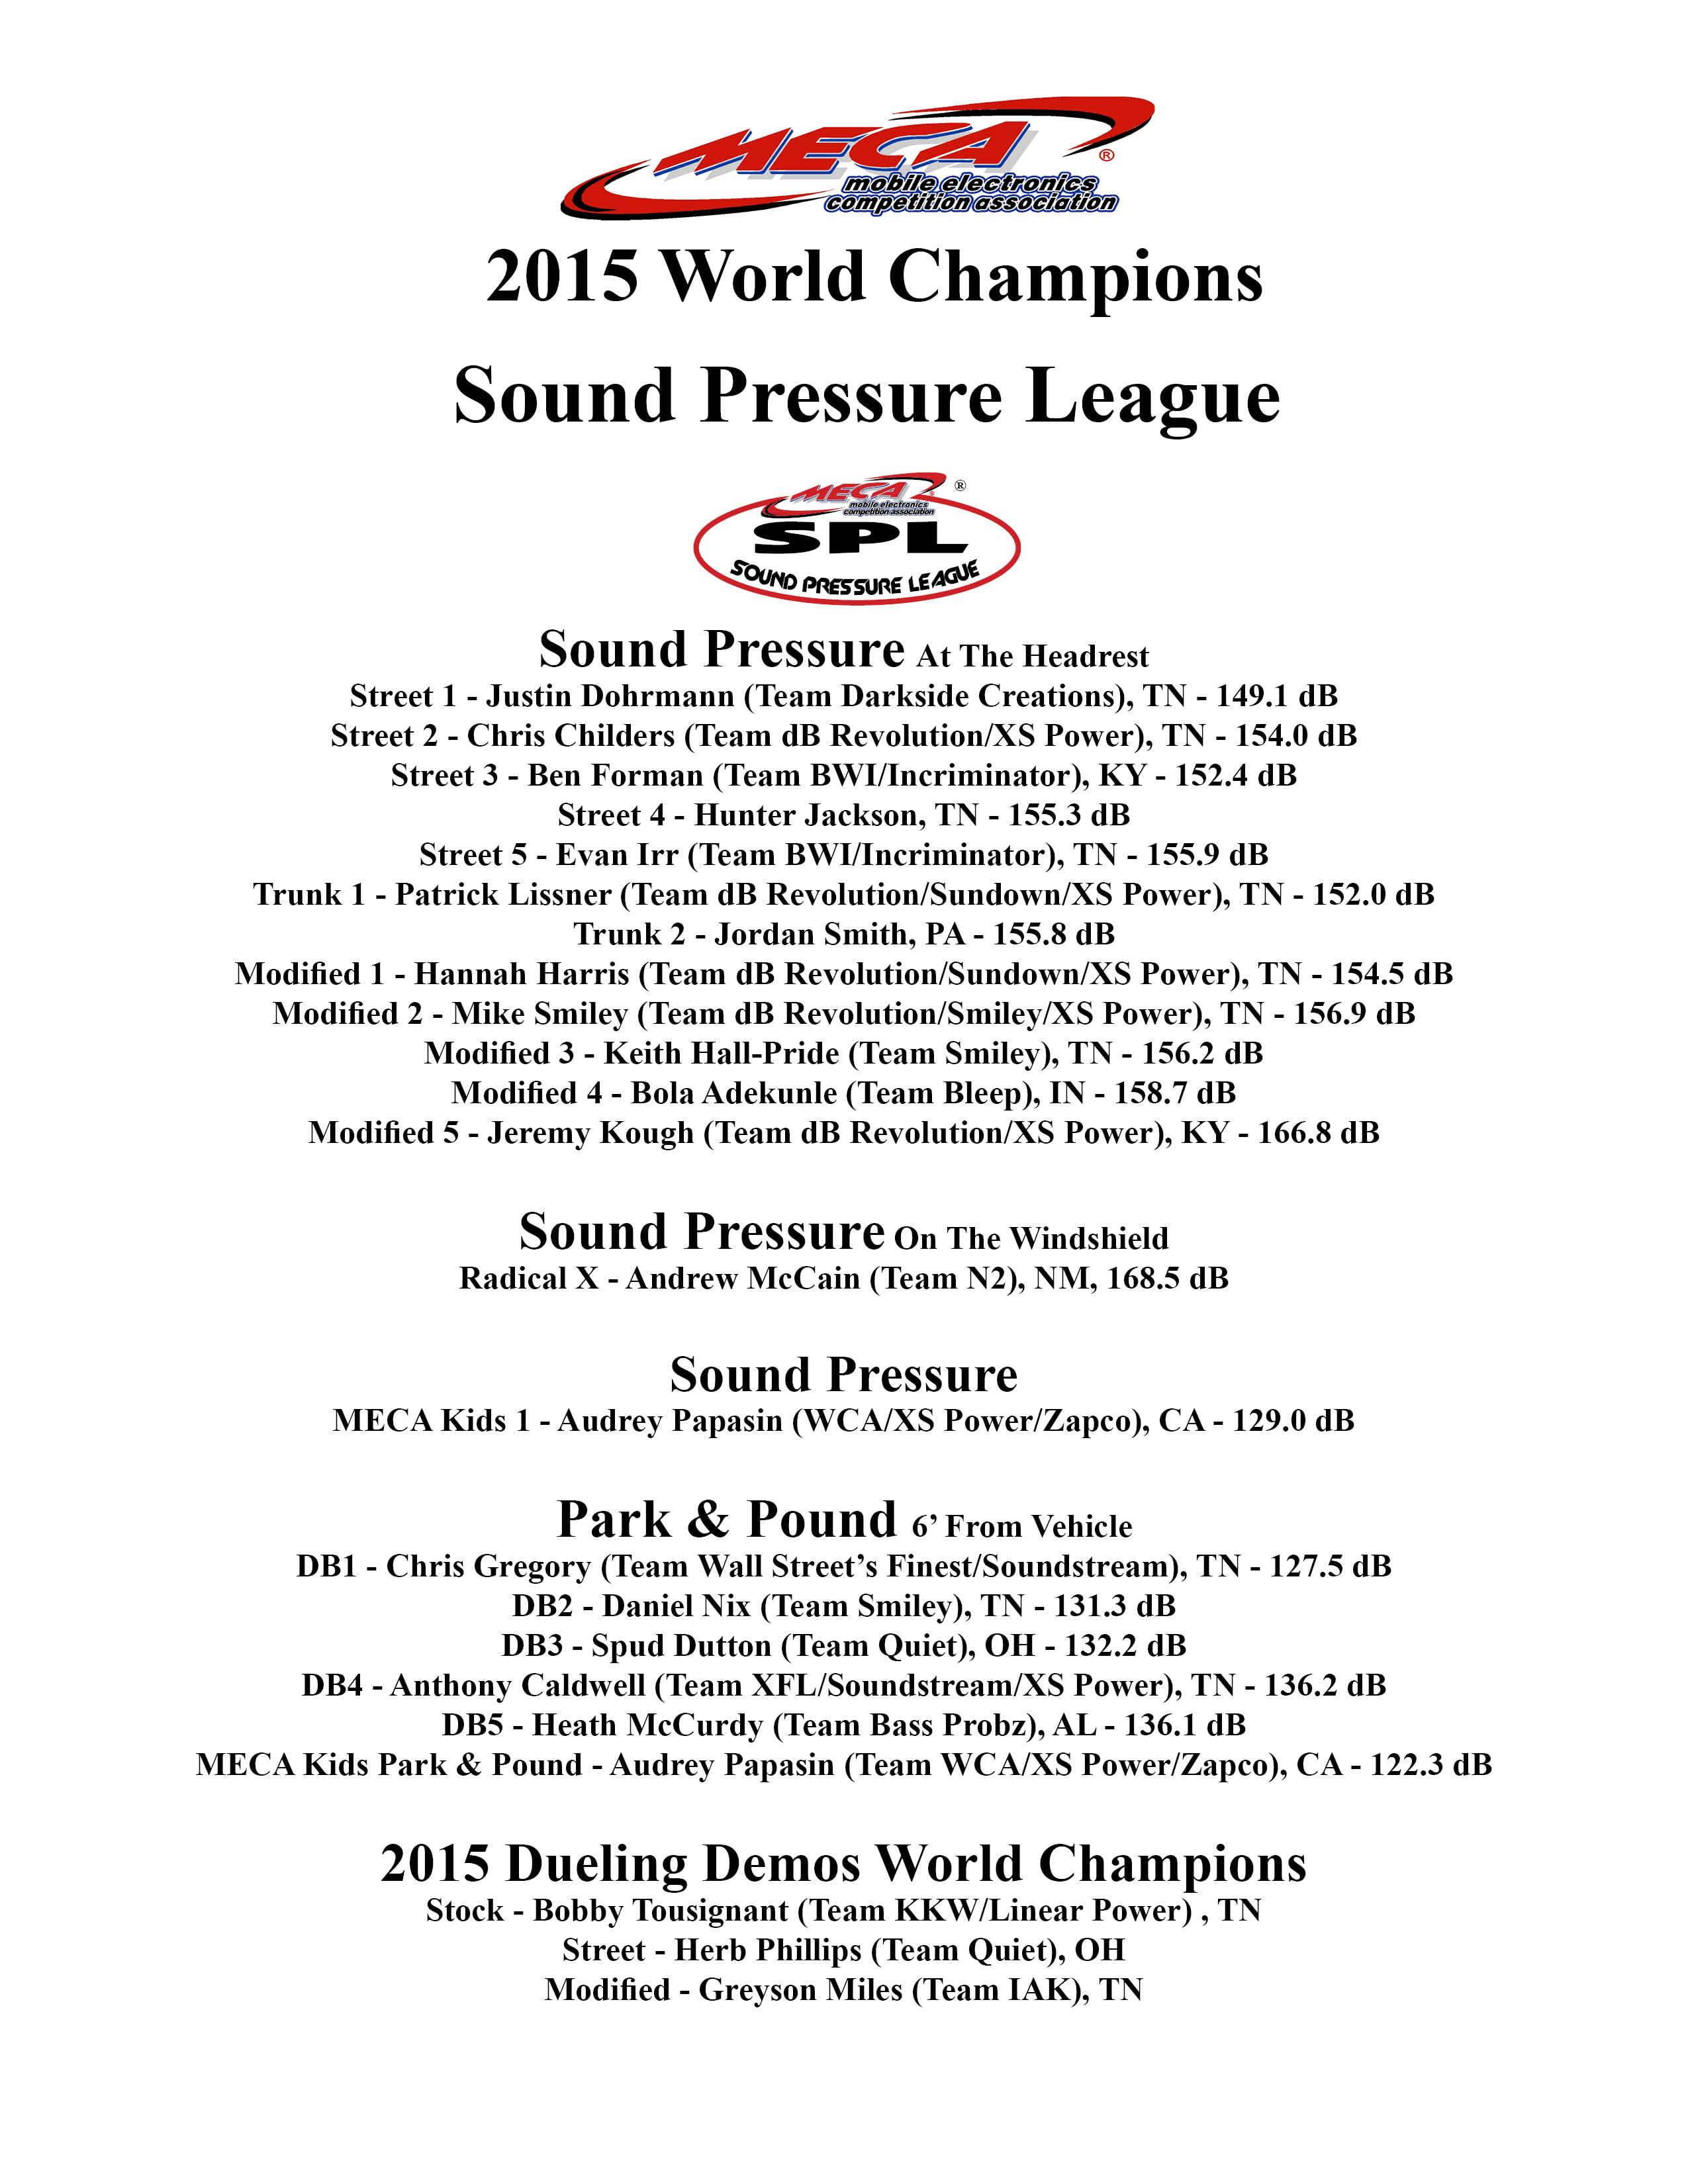 2015 SPL Champs